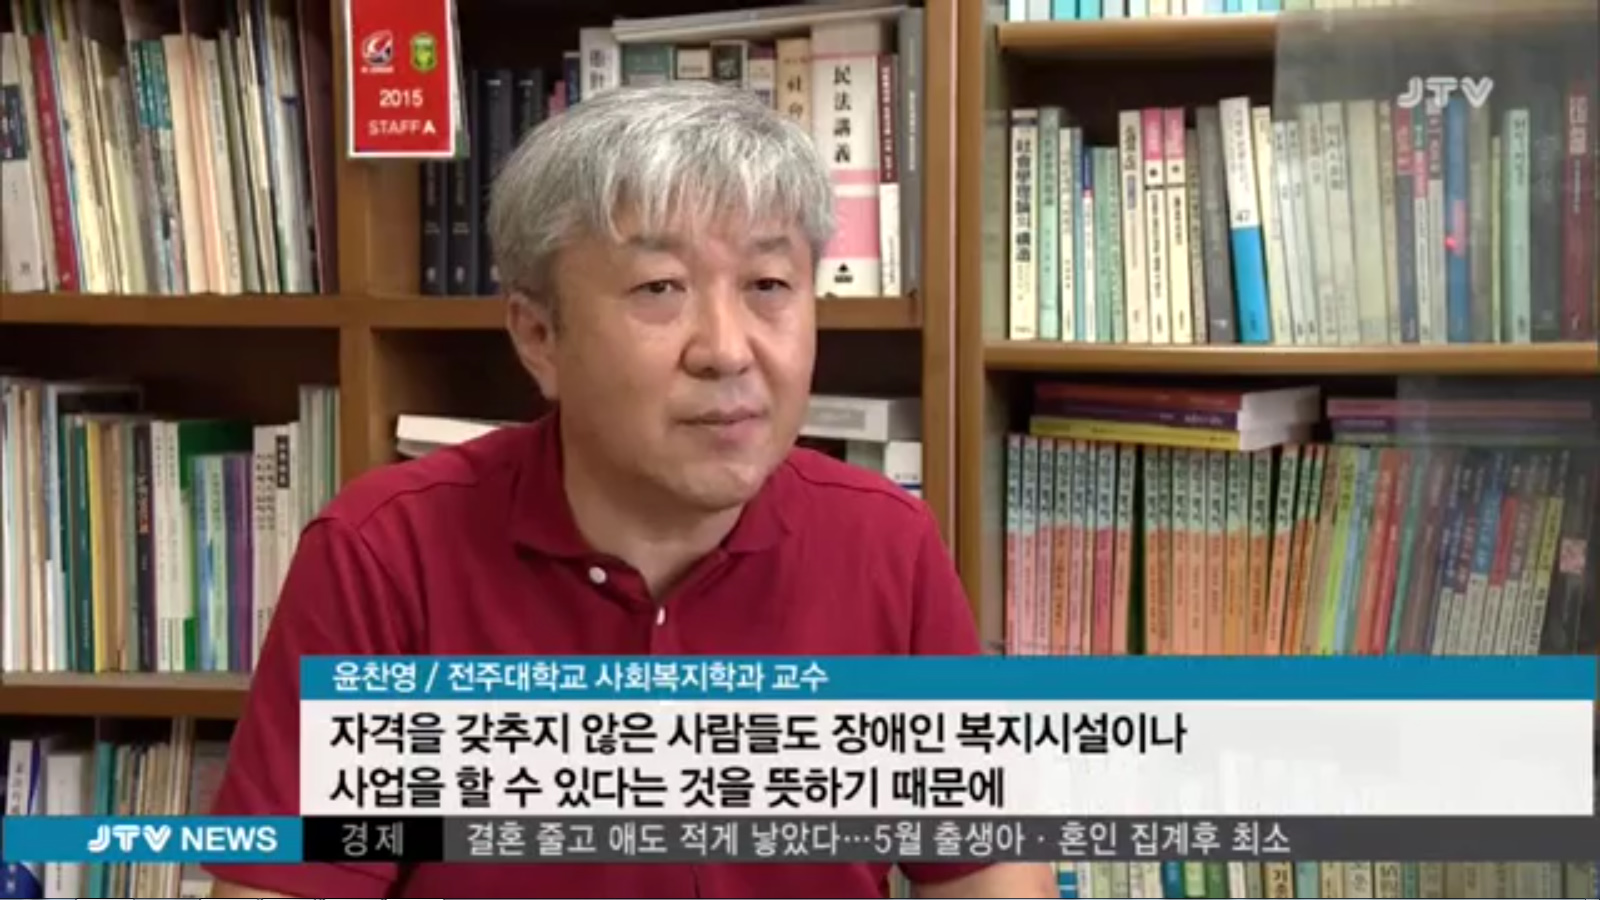 [18.7.25 JTV] 전주 봉침게이트, 검찰은 기소축소 법원은 재판거래... 의혹23.jpg